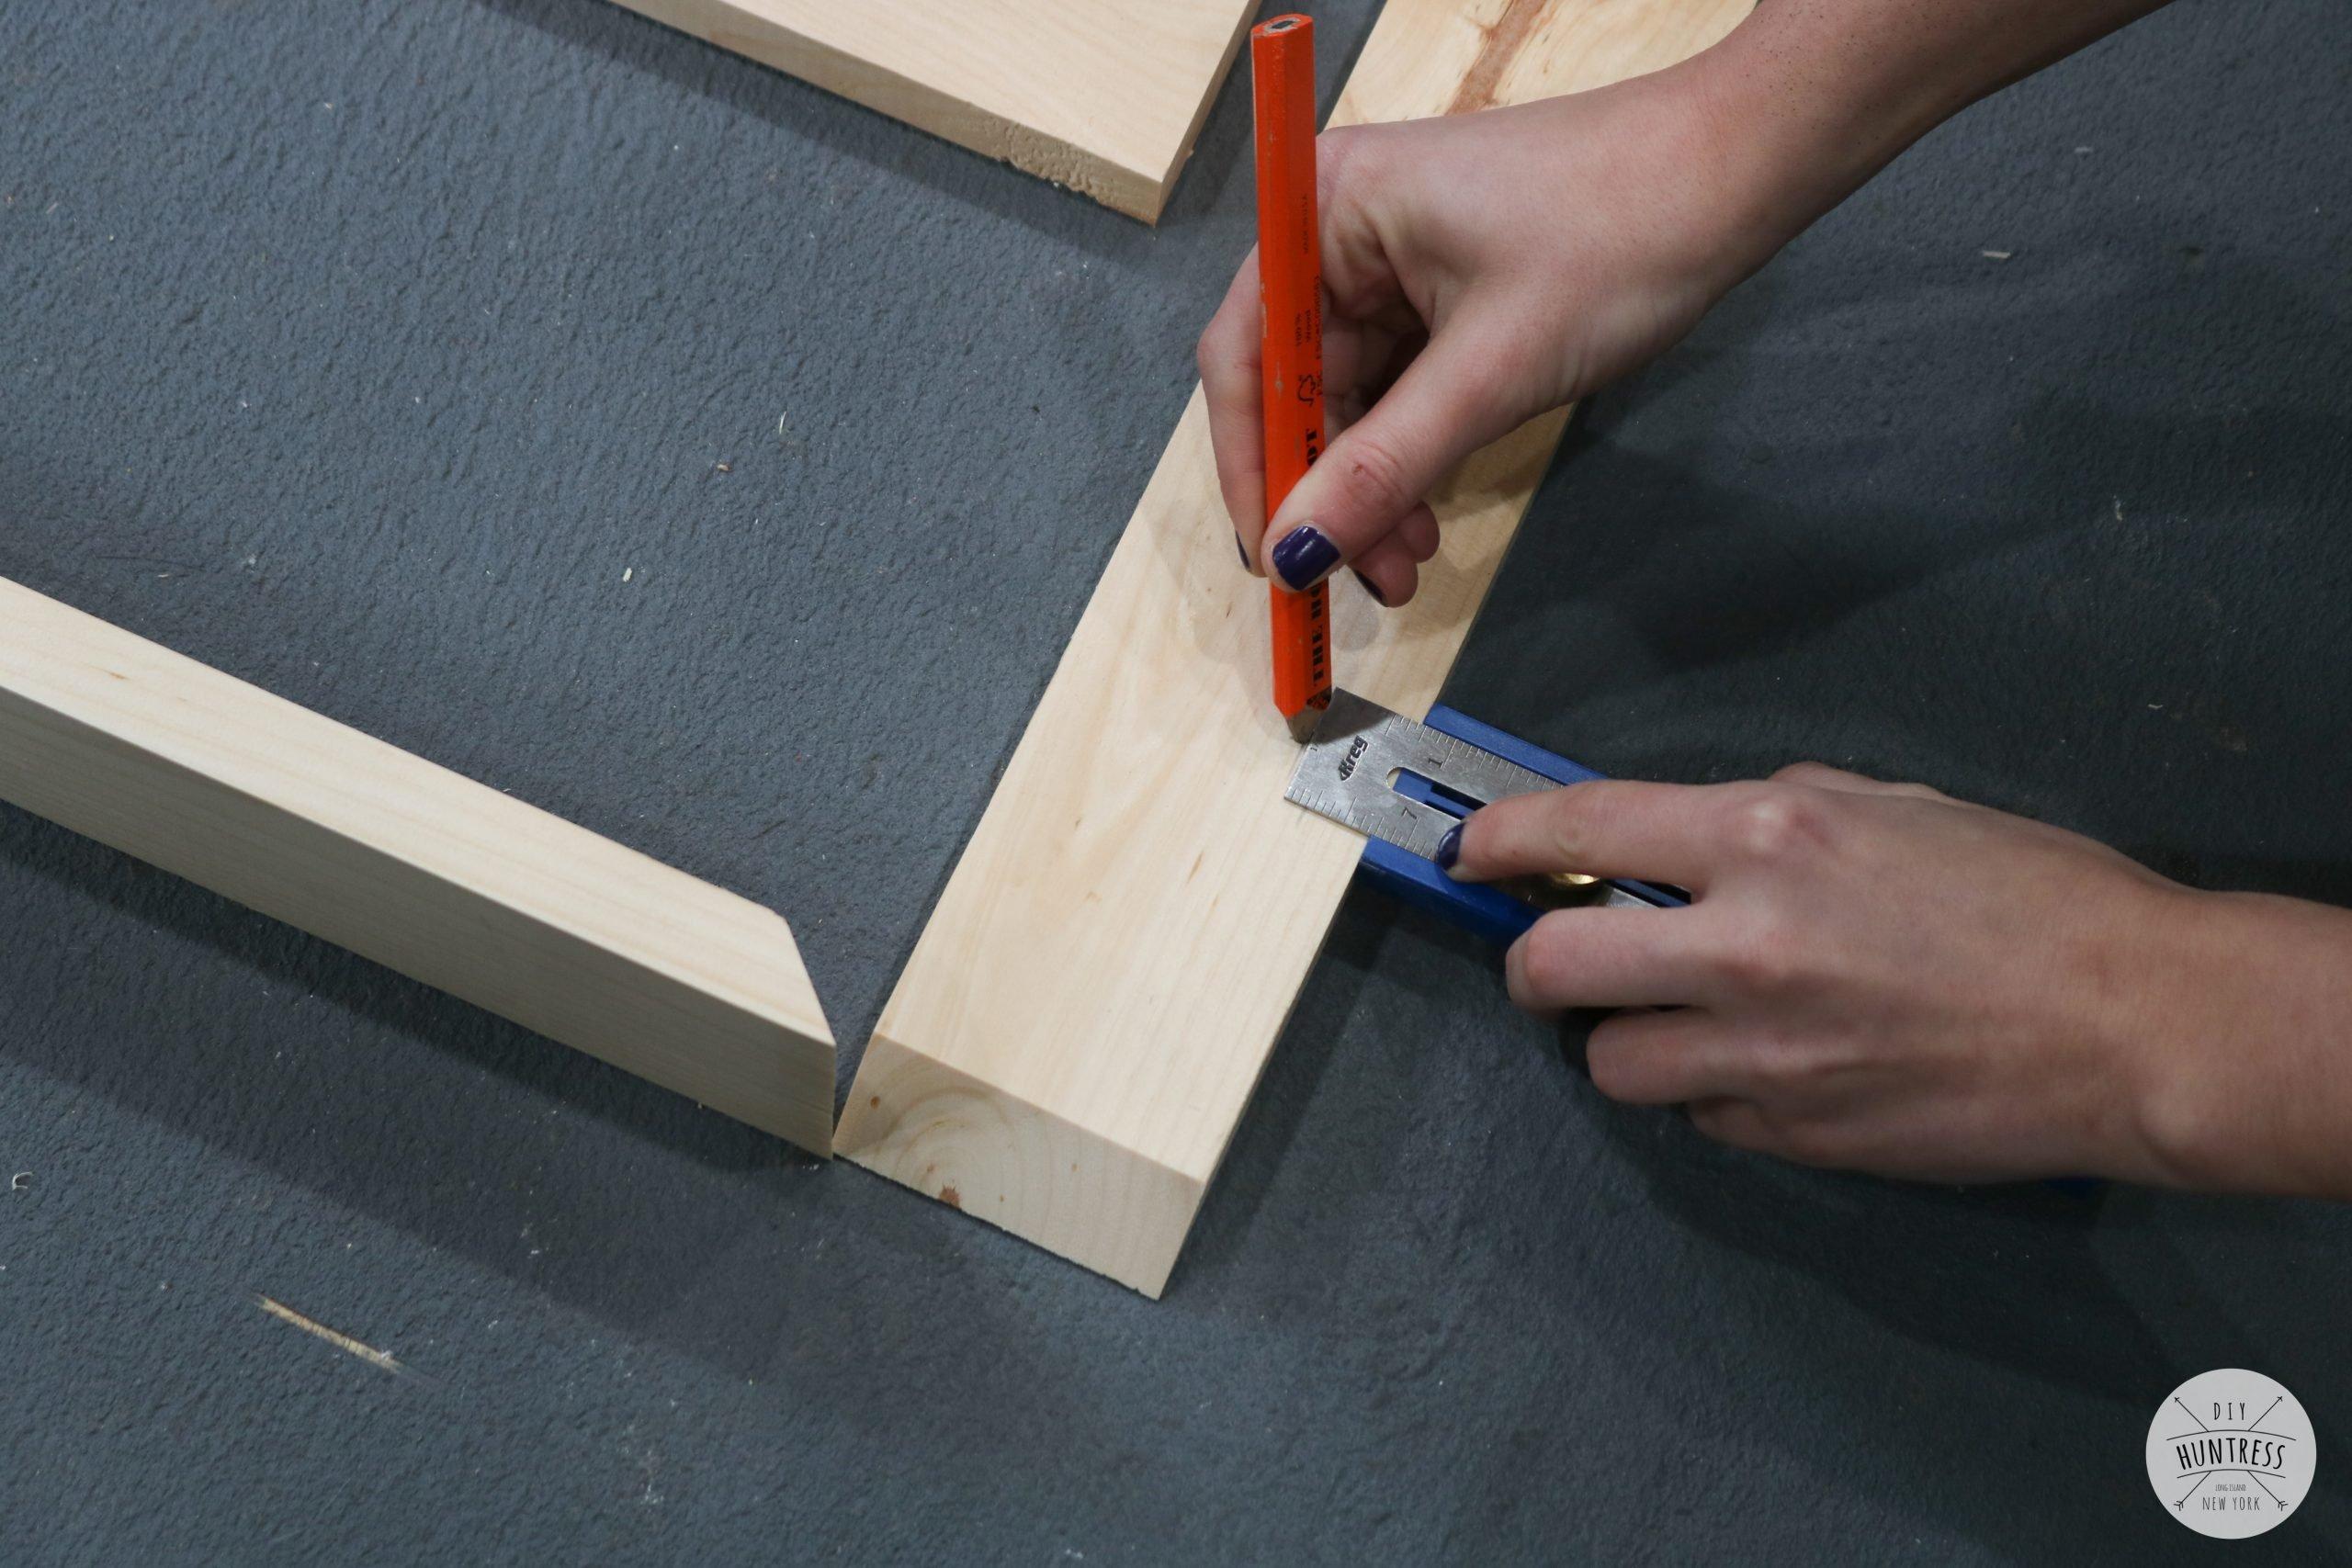 marking measurements on wood